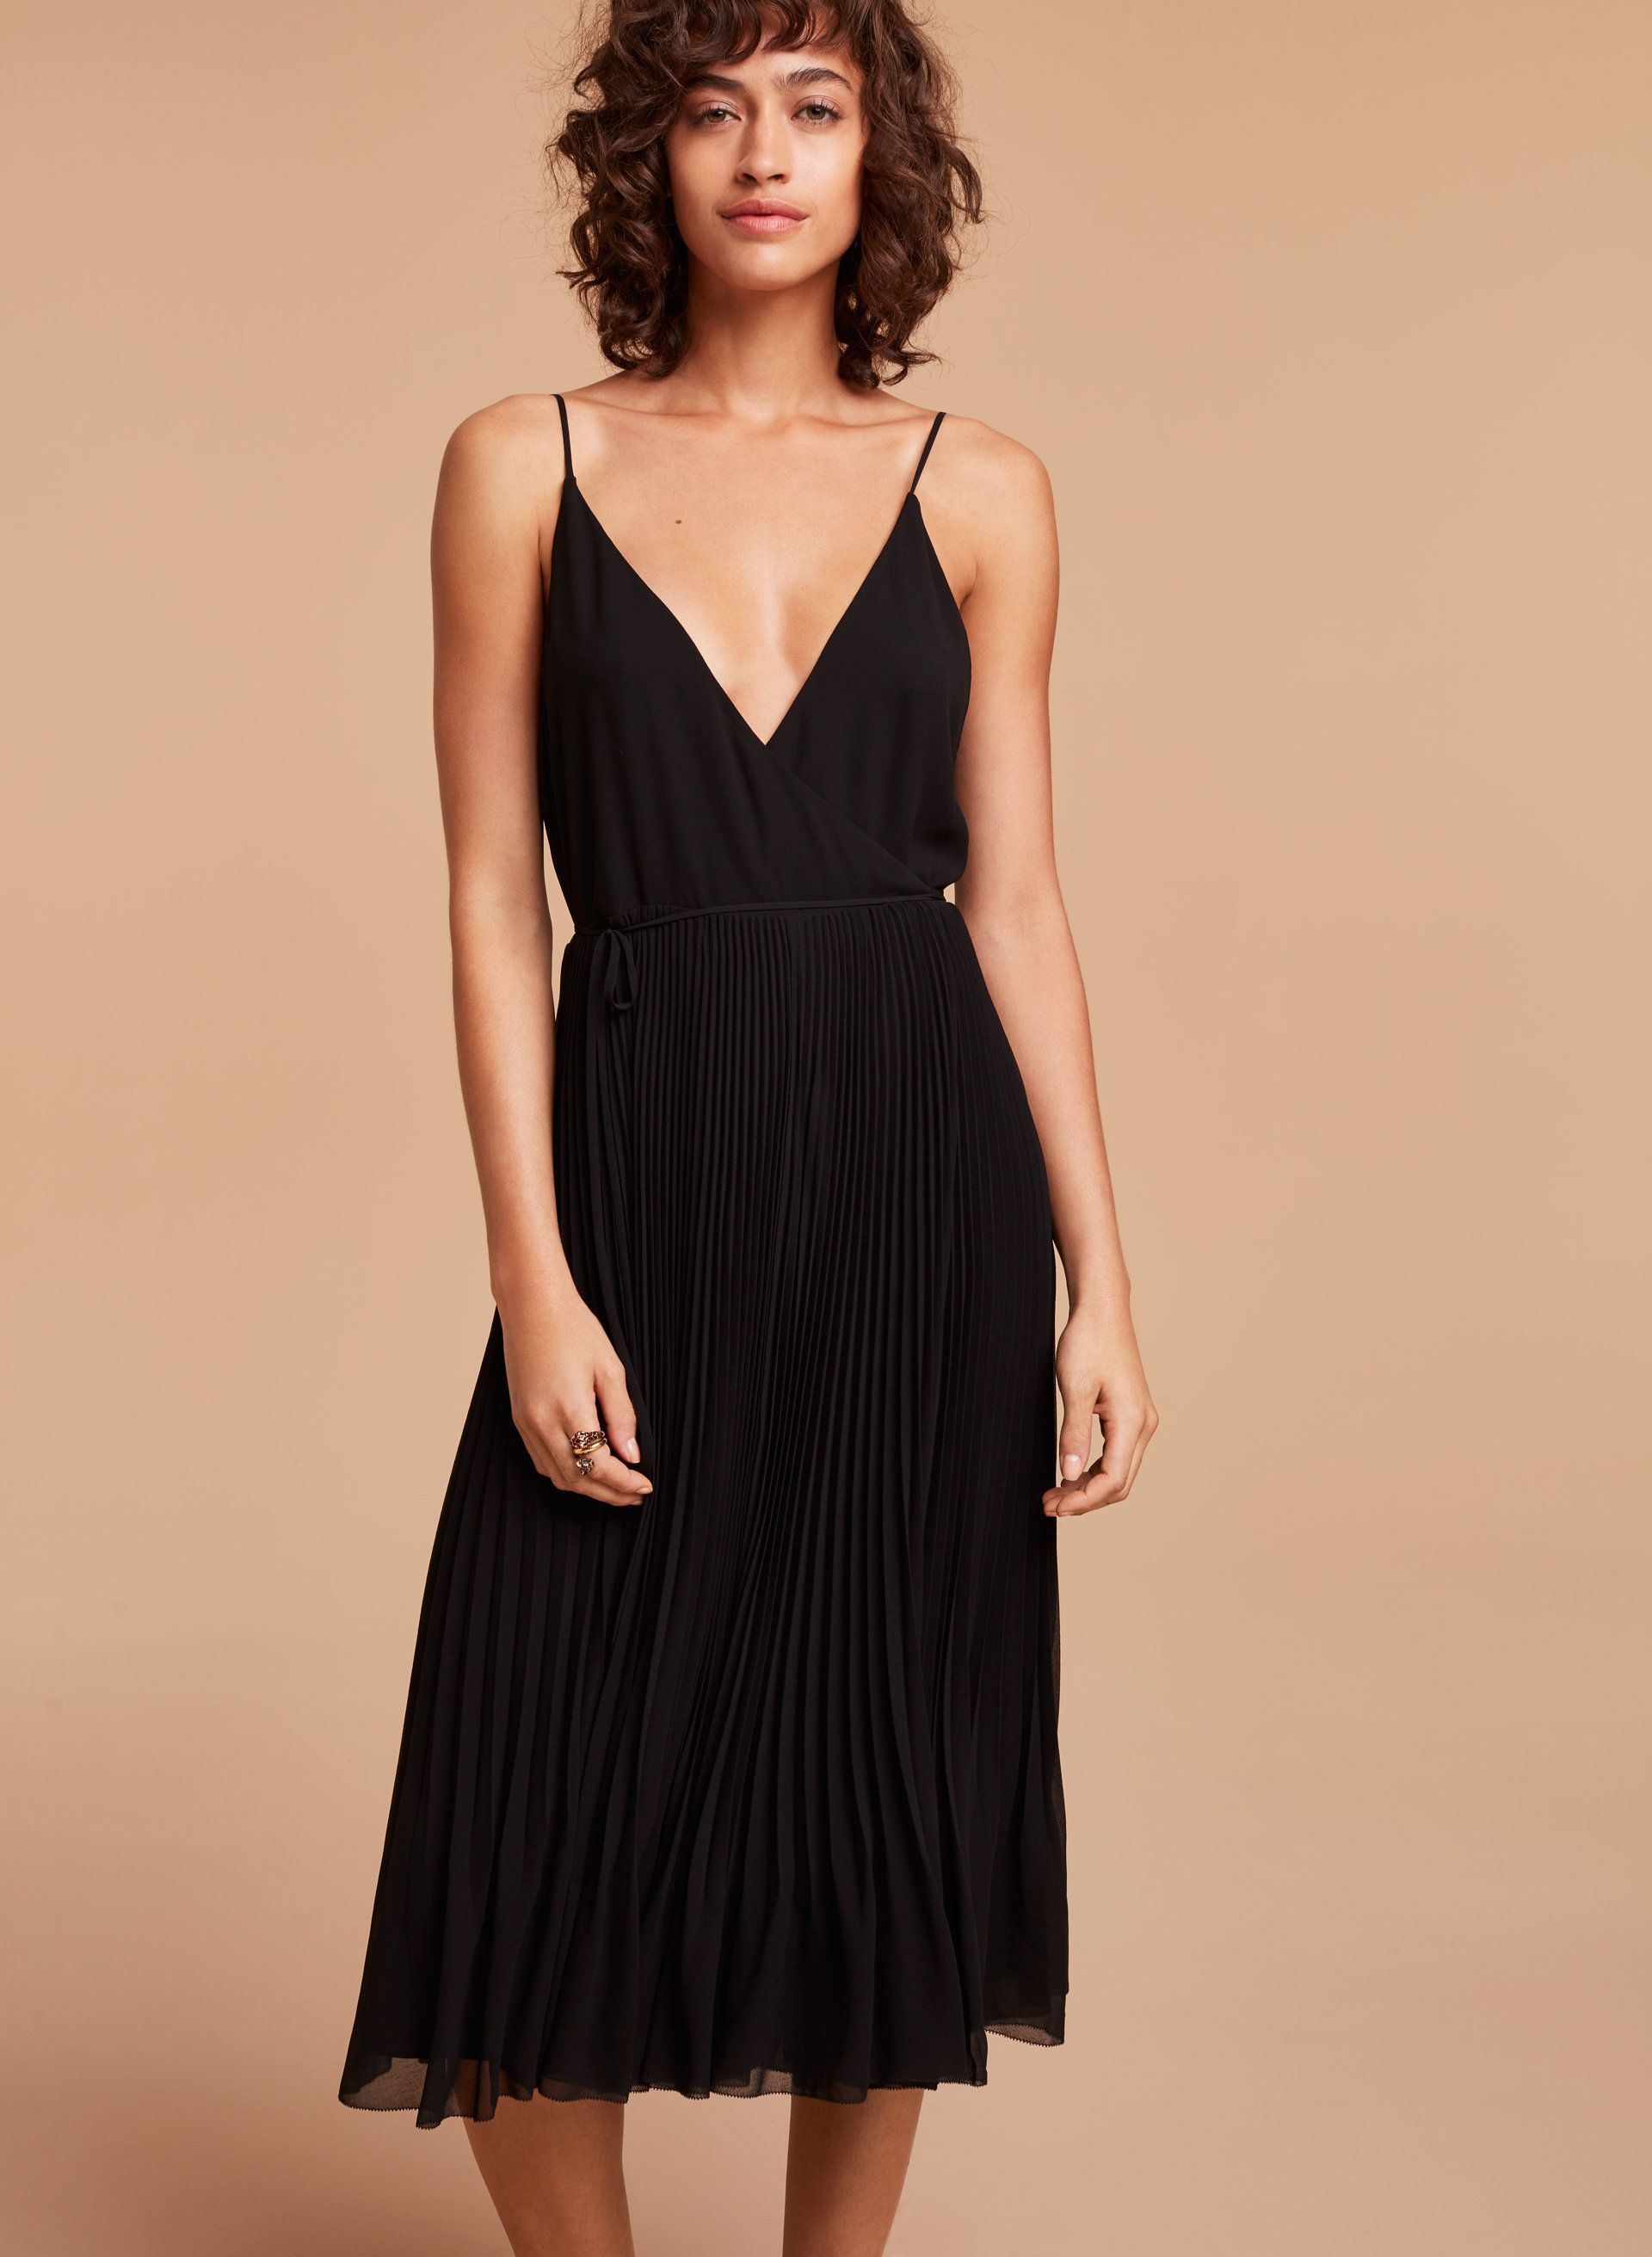 6c8cb87660 Beaune dress | ZARA 2017 | Dresses, Formal dresses, Fashion